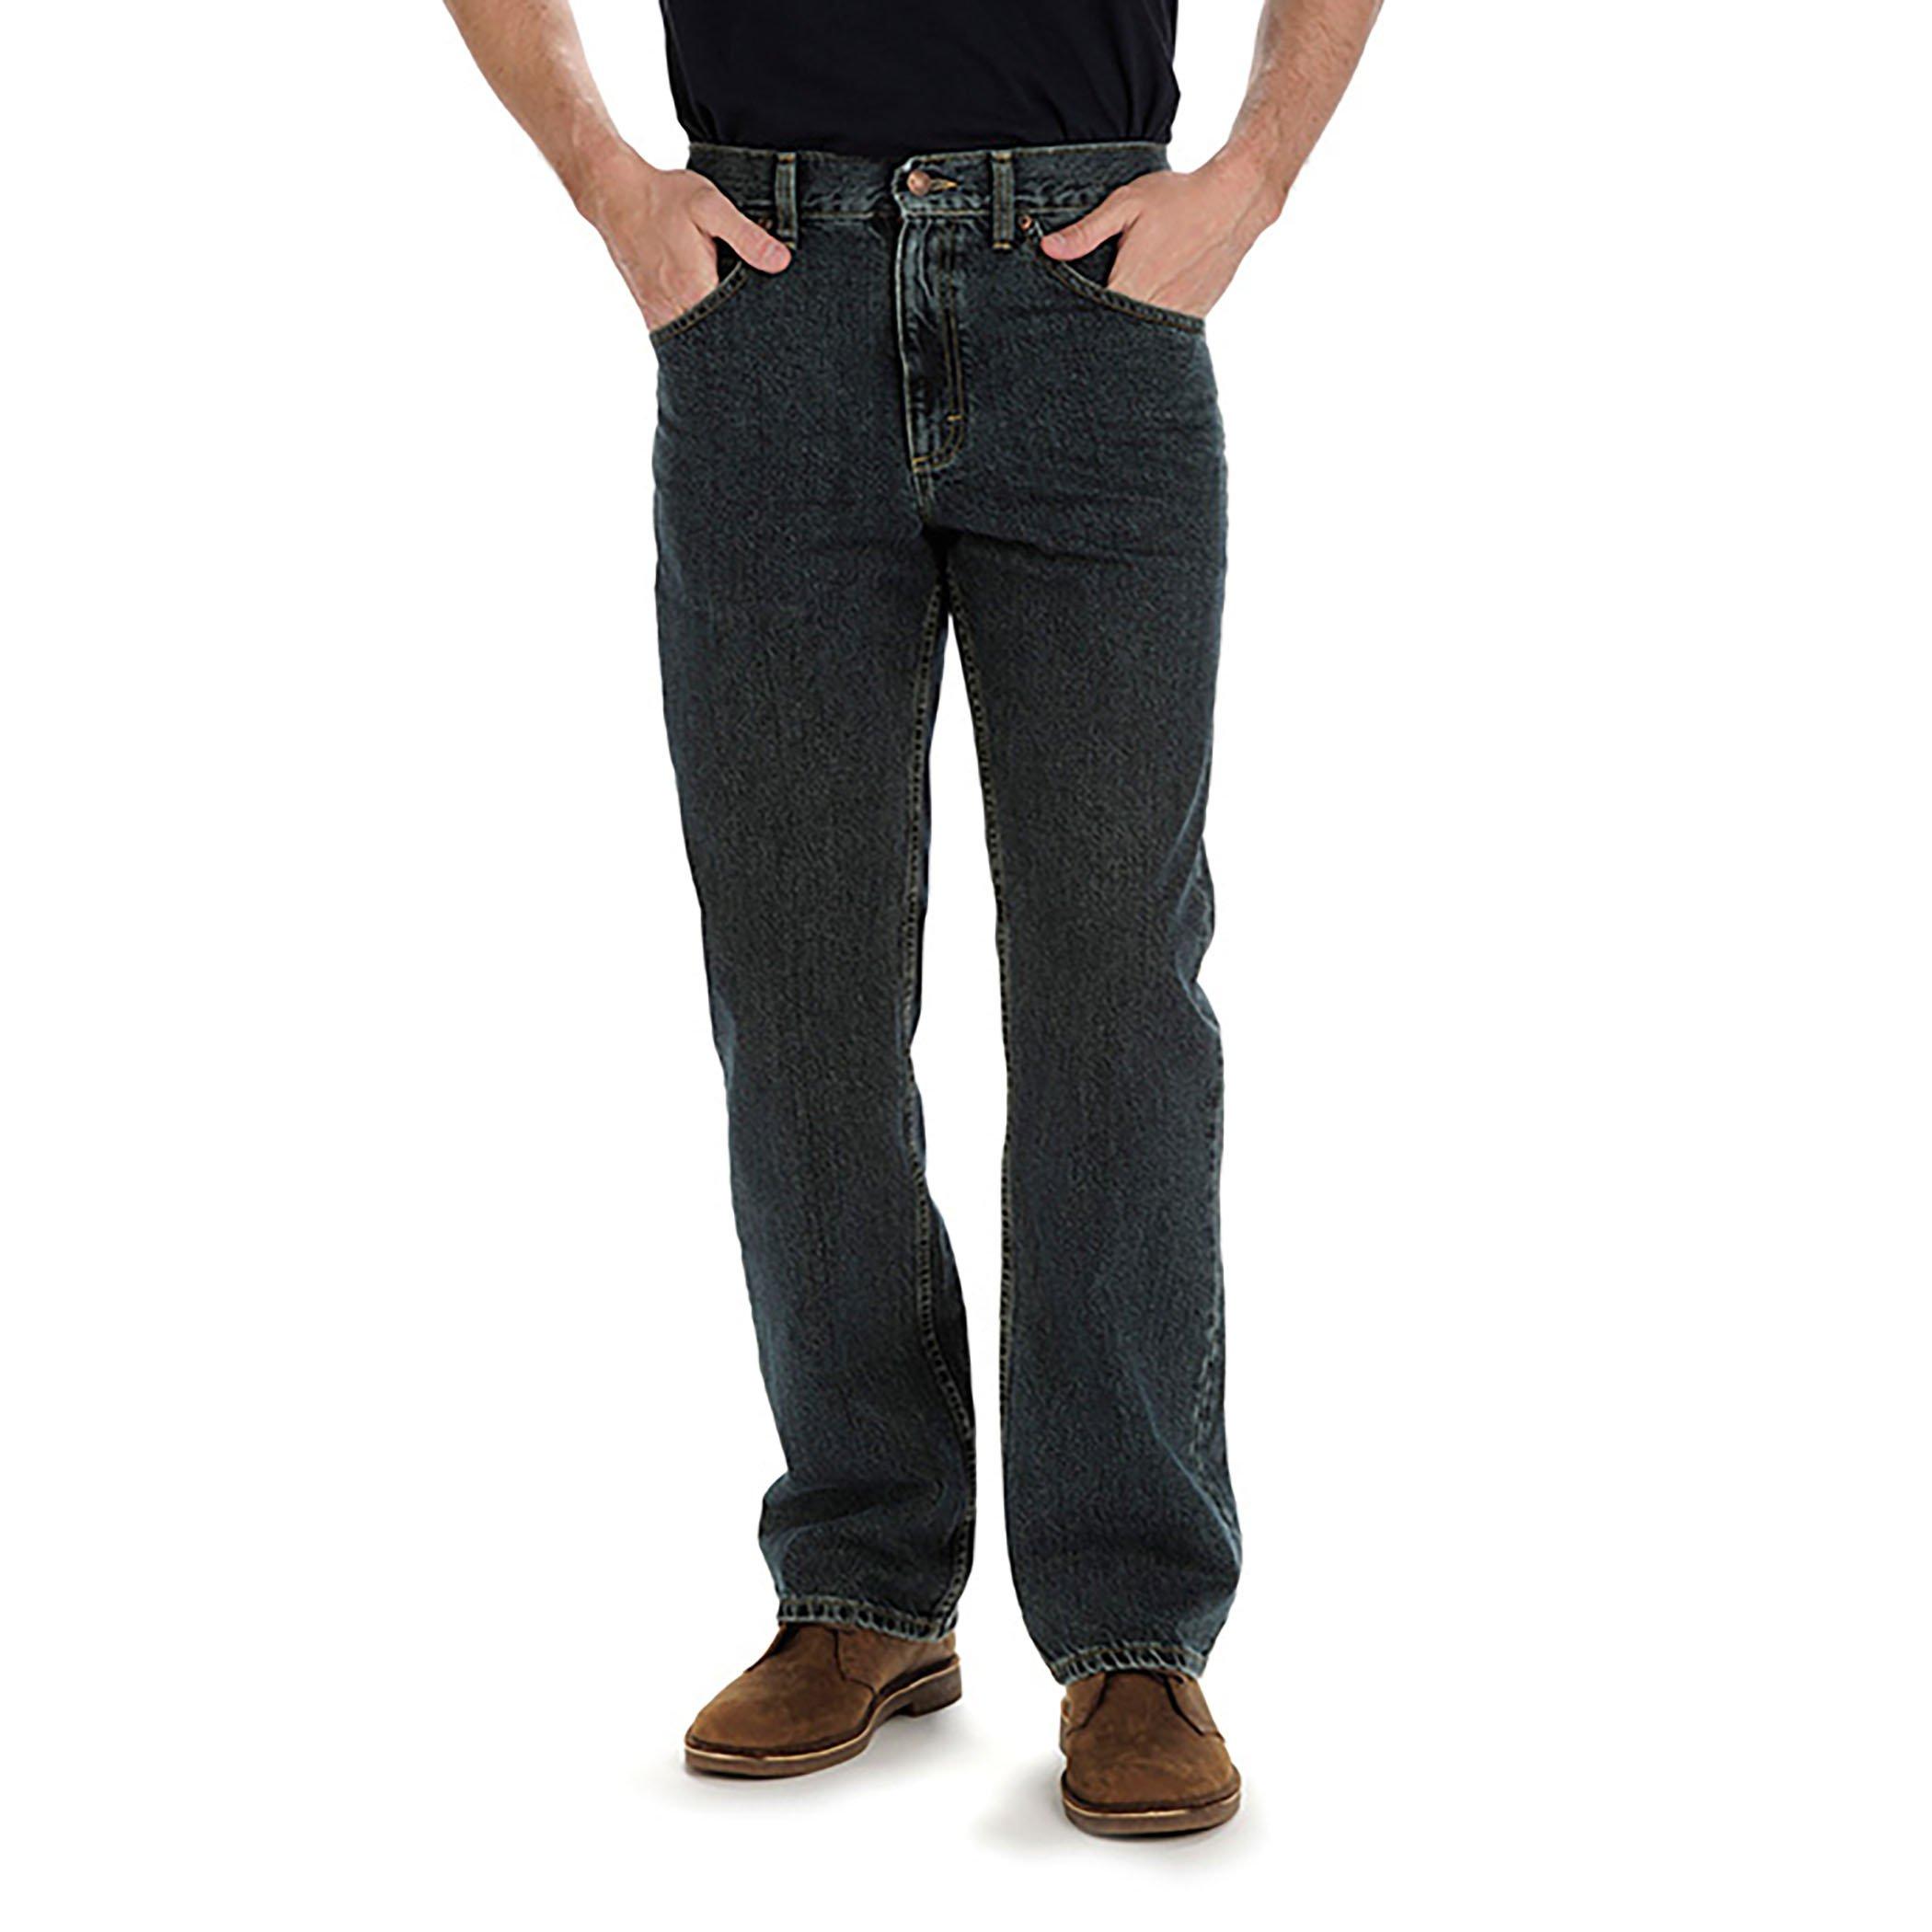 LEE 20203 Men's Regular Fit Bootcut Jeans, Quartz Stone - 38W x 29L